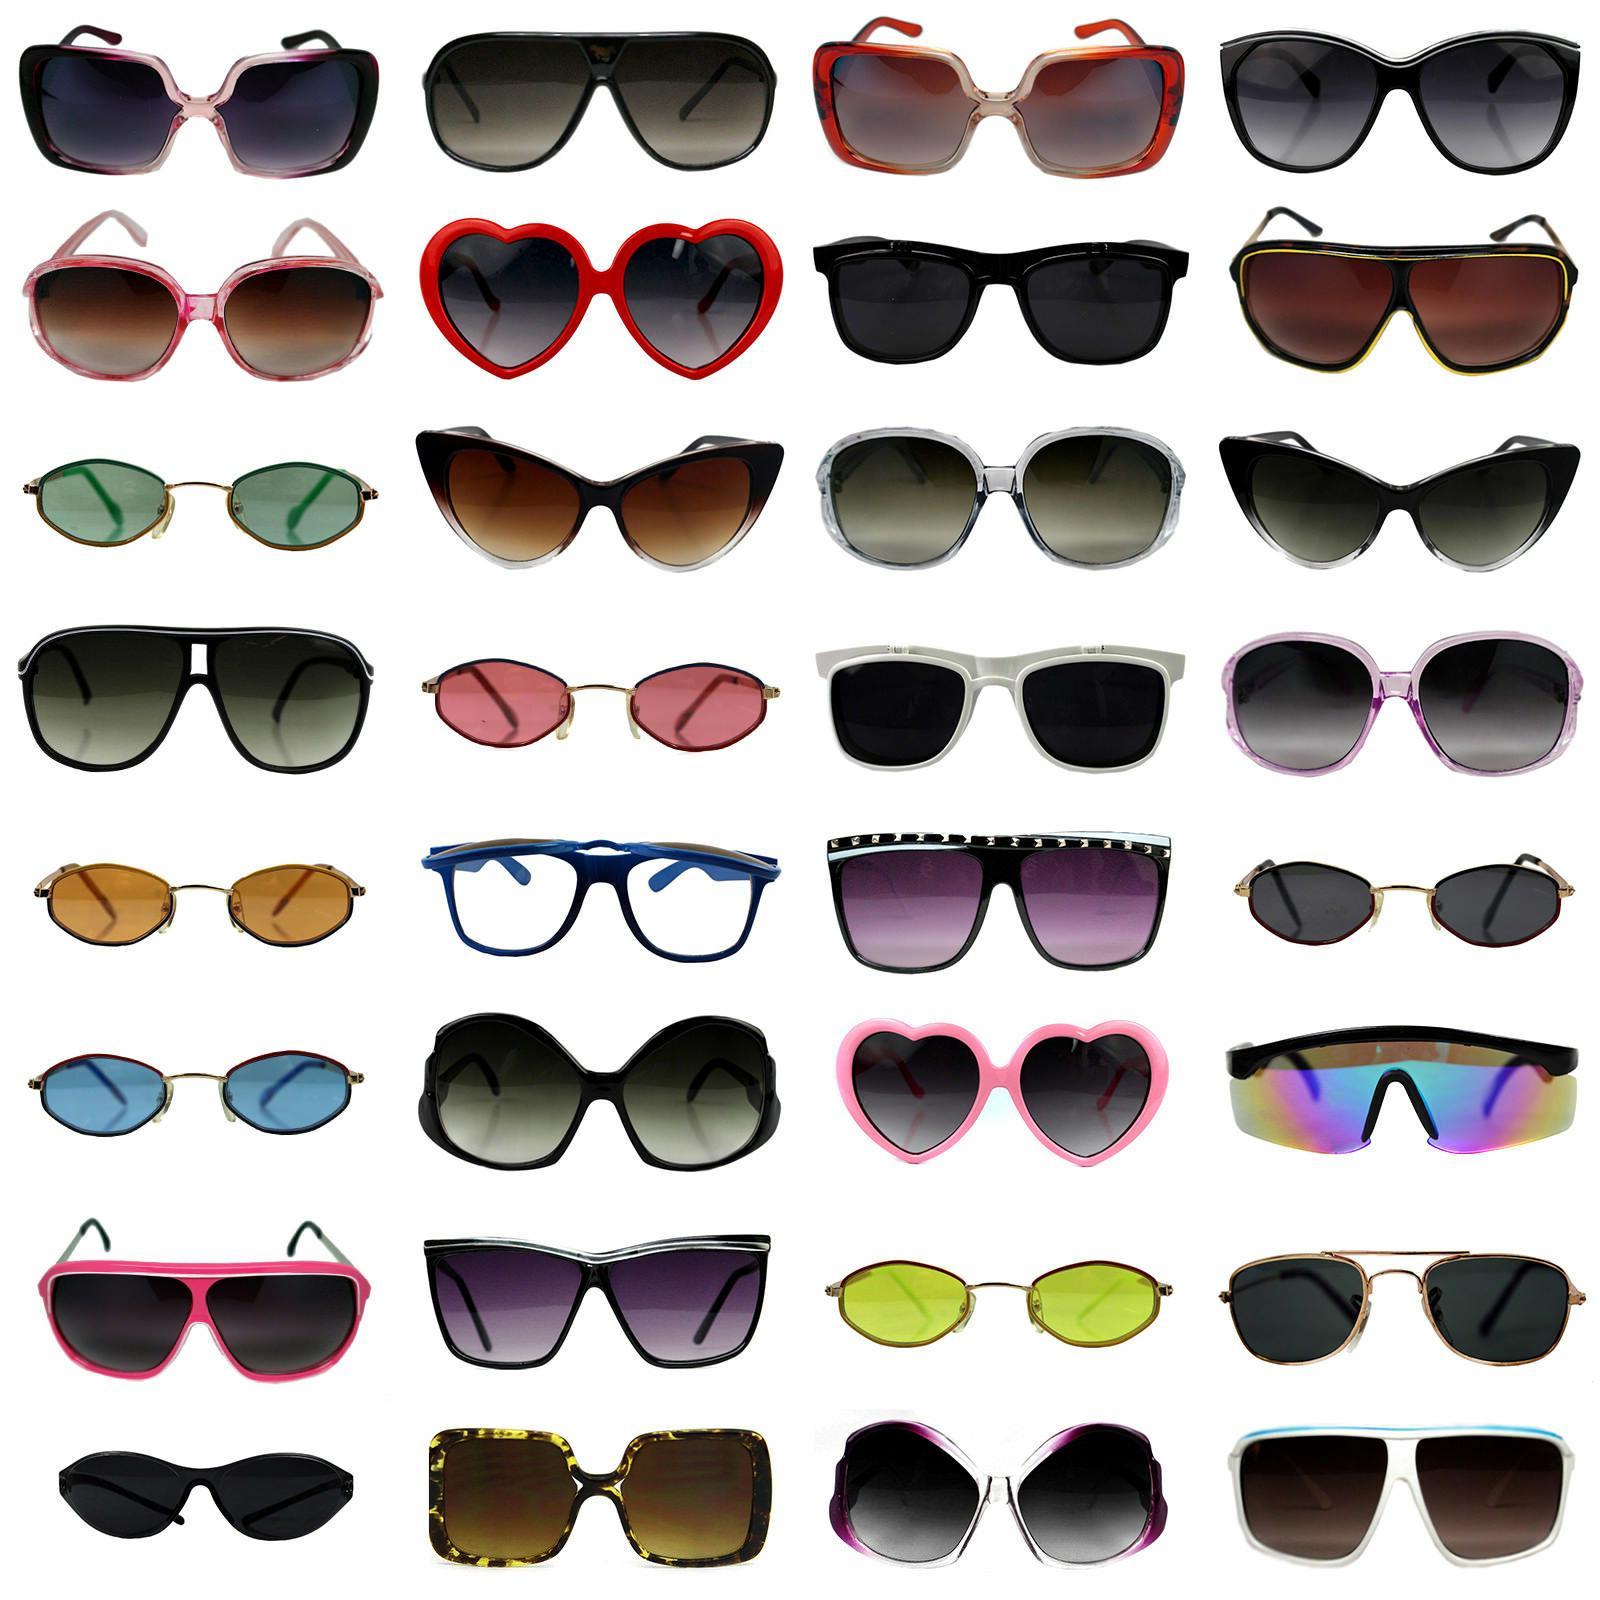 bulk wholesale sunglasses lot of 10 to